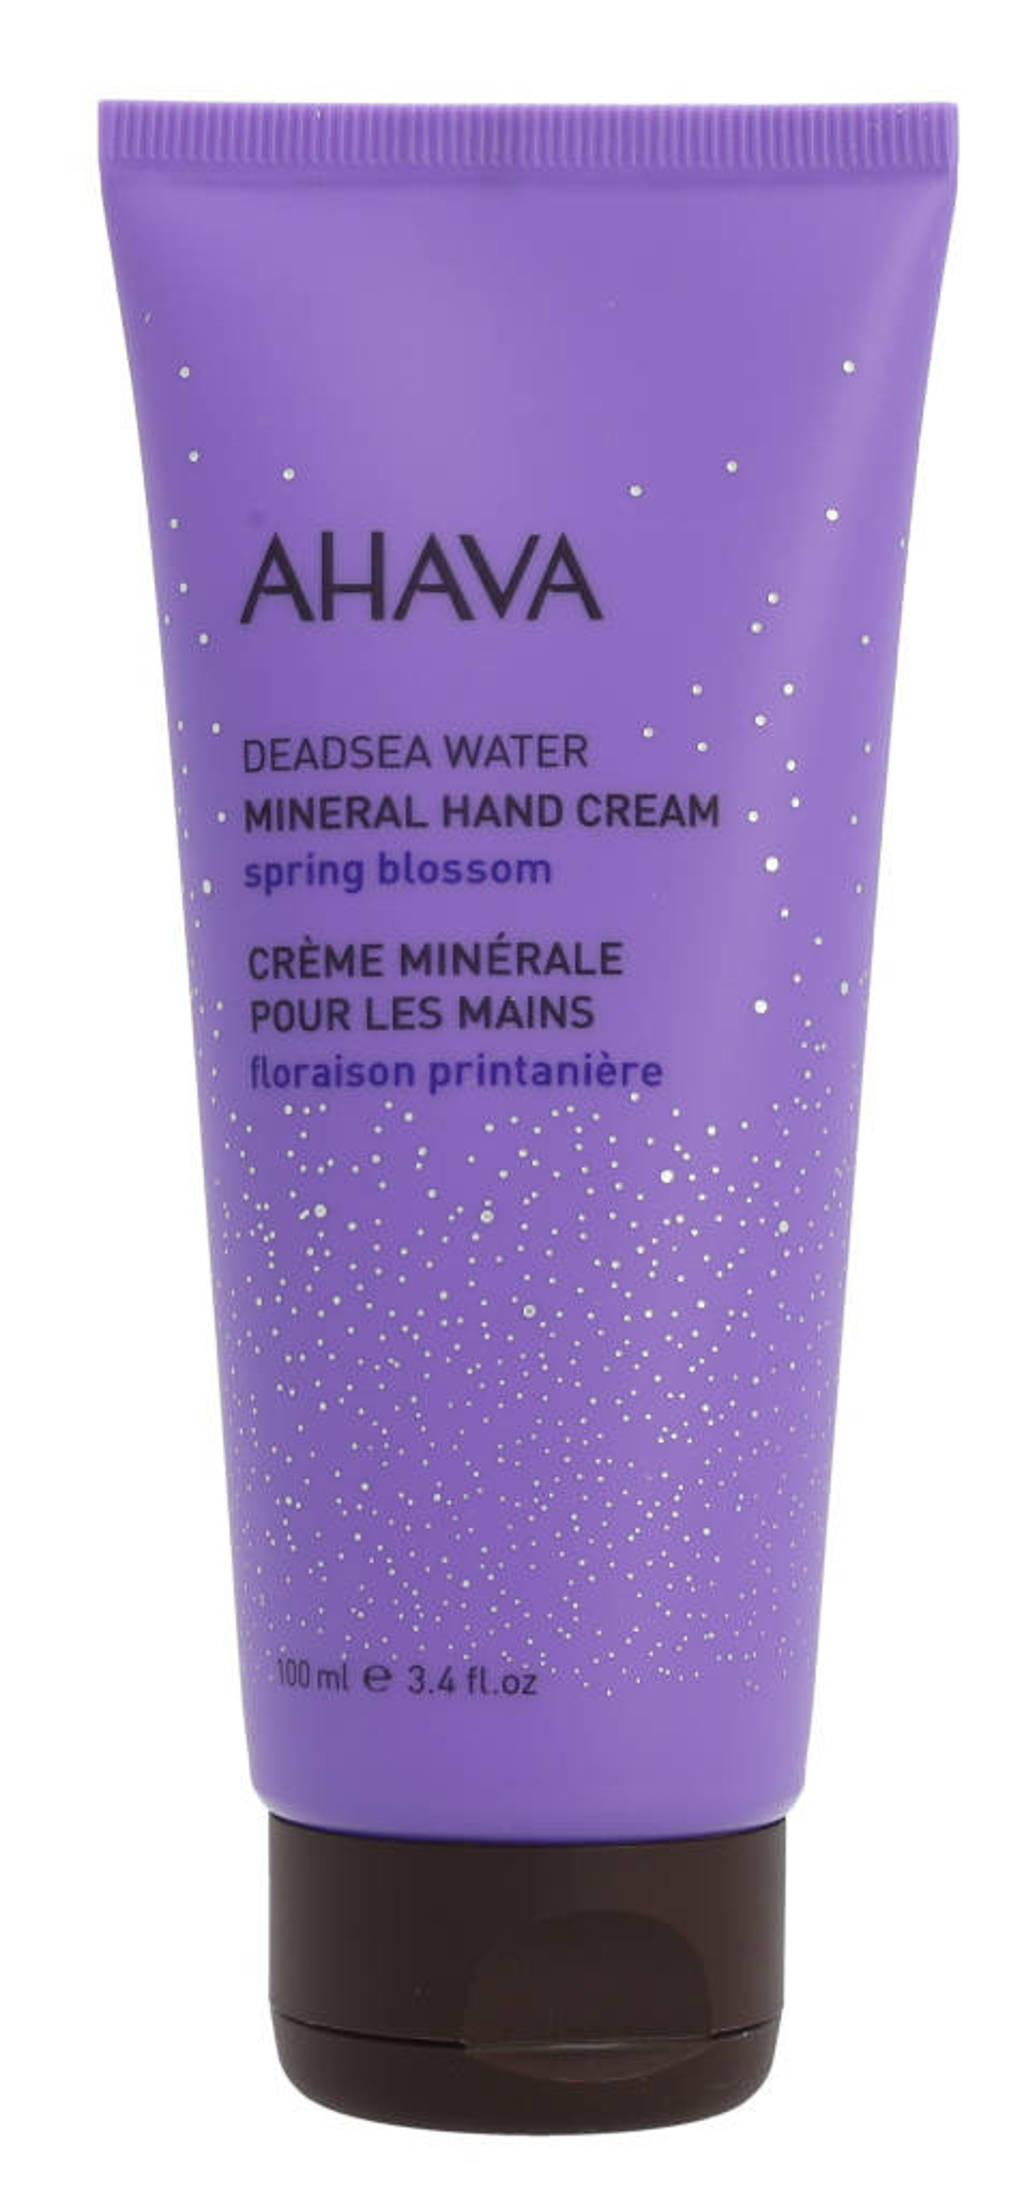 Ahava Deadsea Water Mineral handcrème